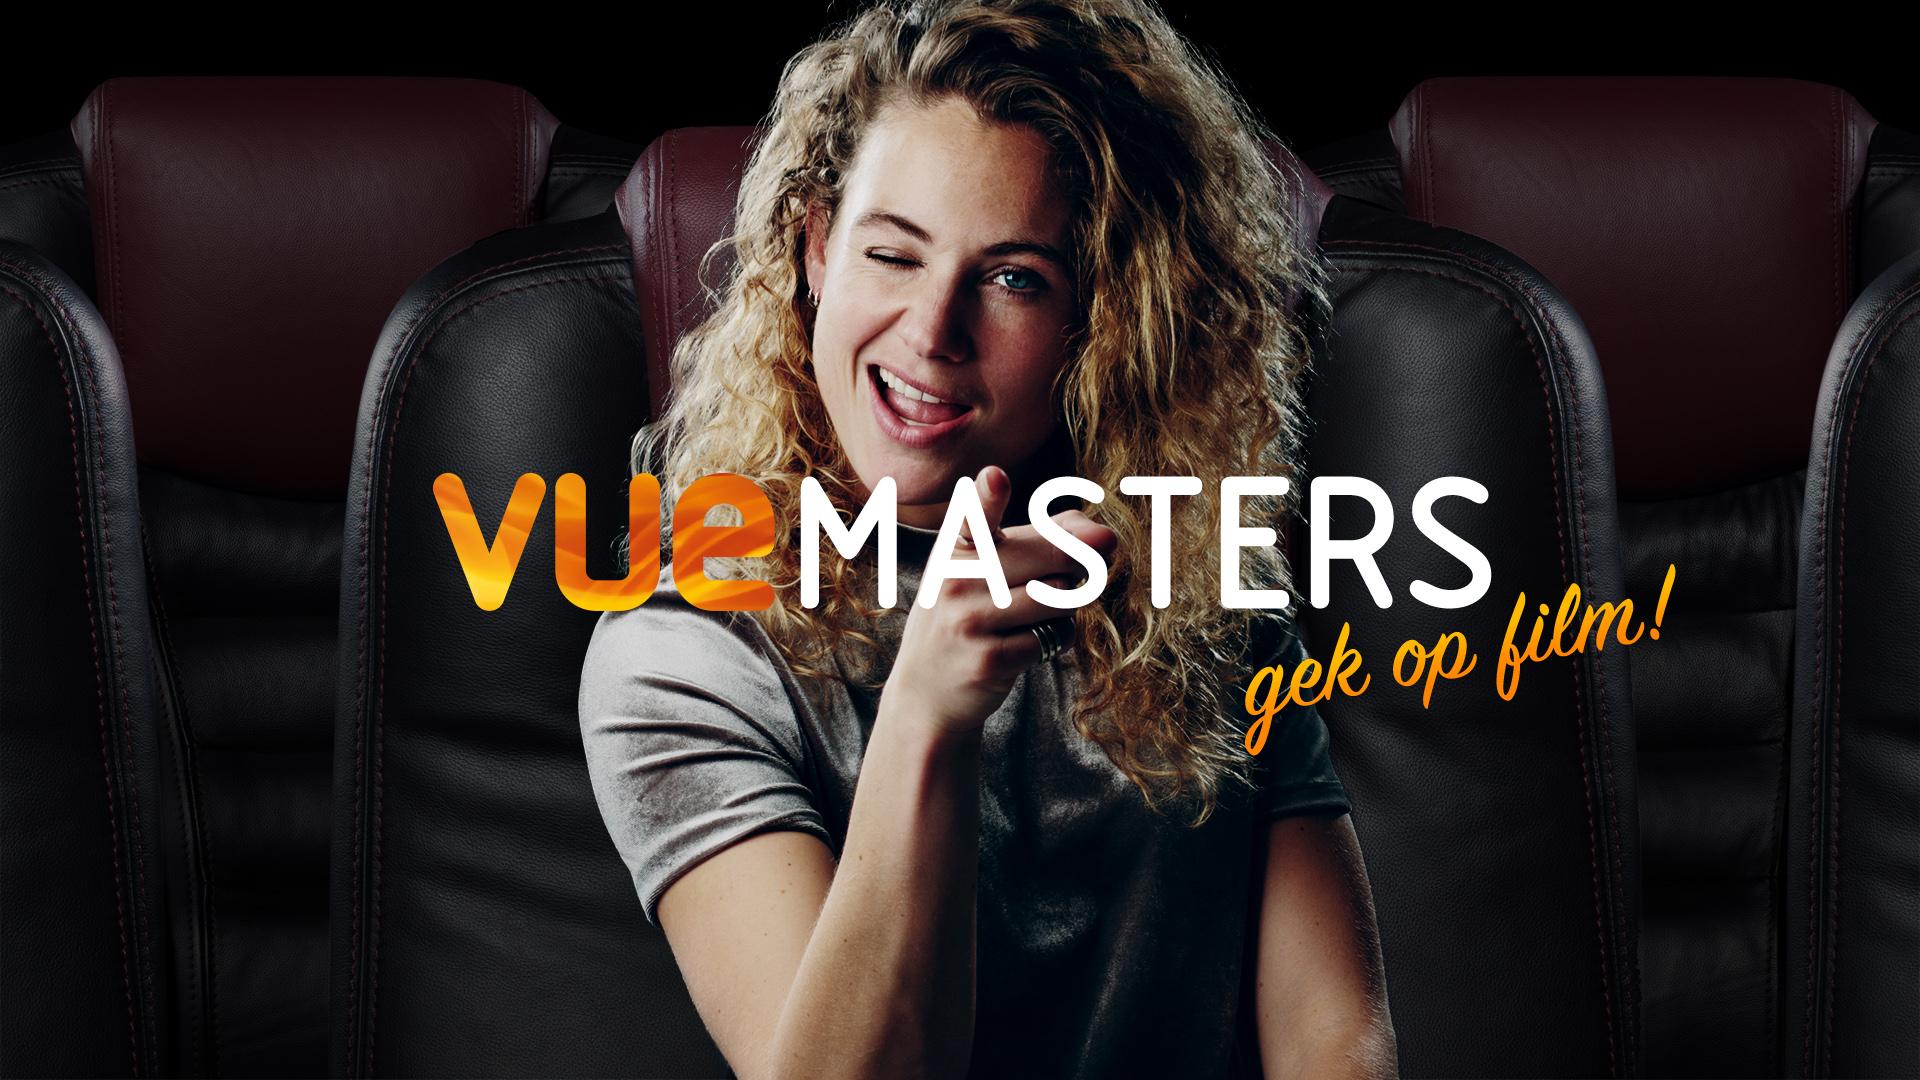 VUEMASTERS_KeyVisual